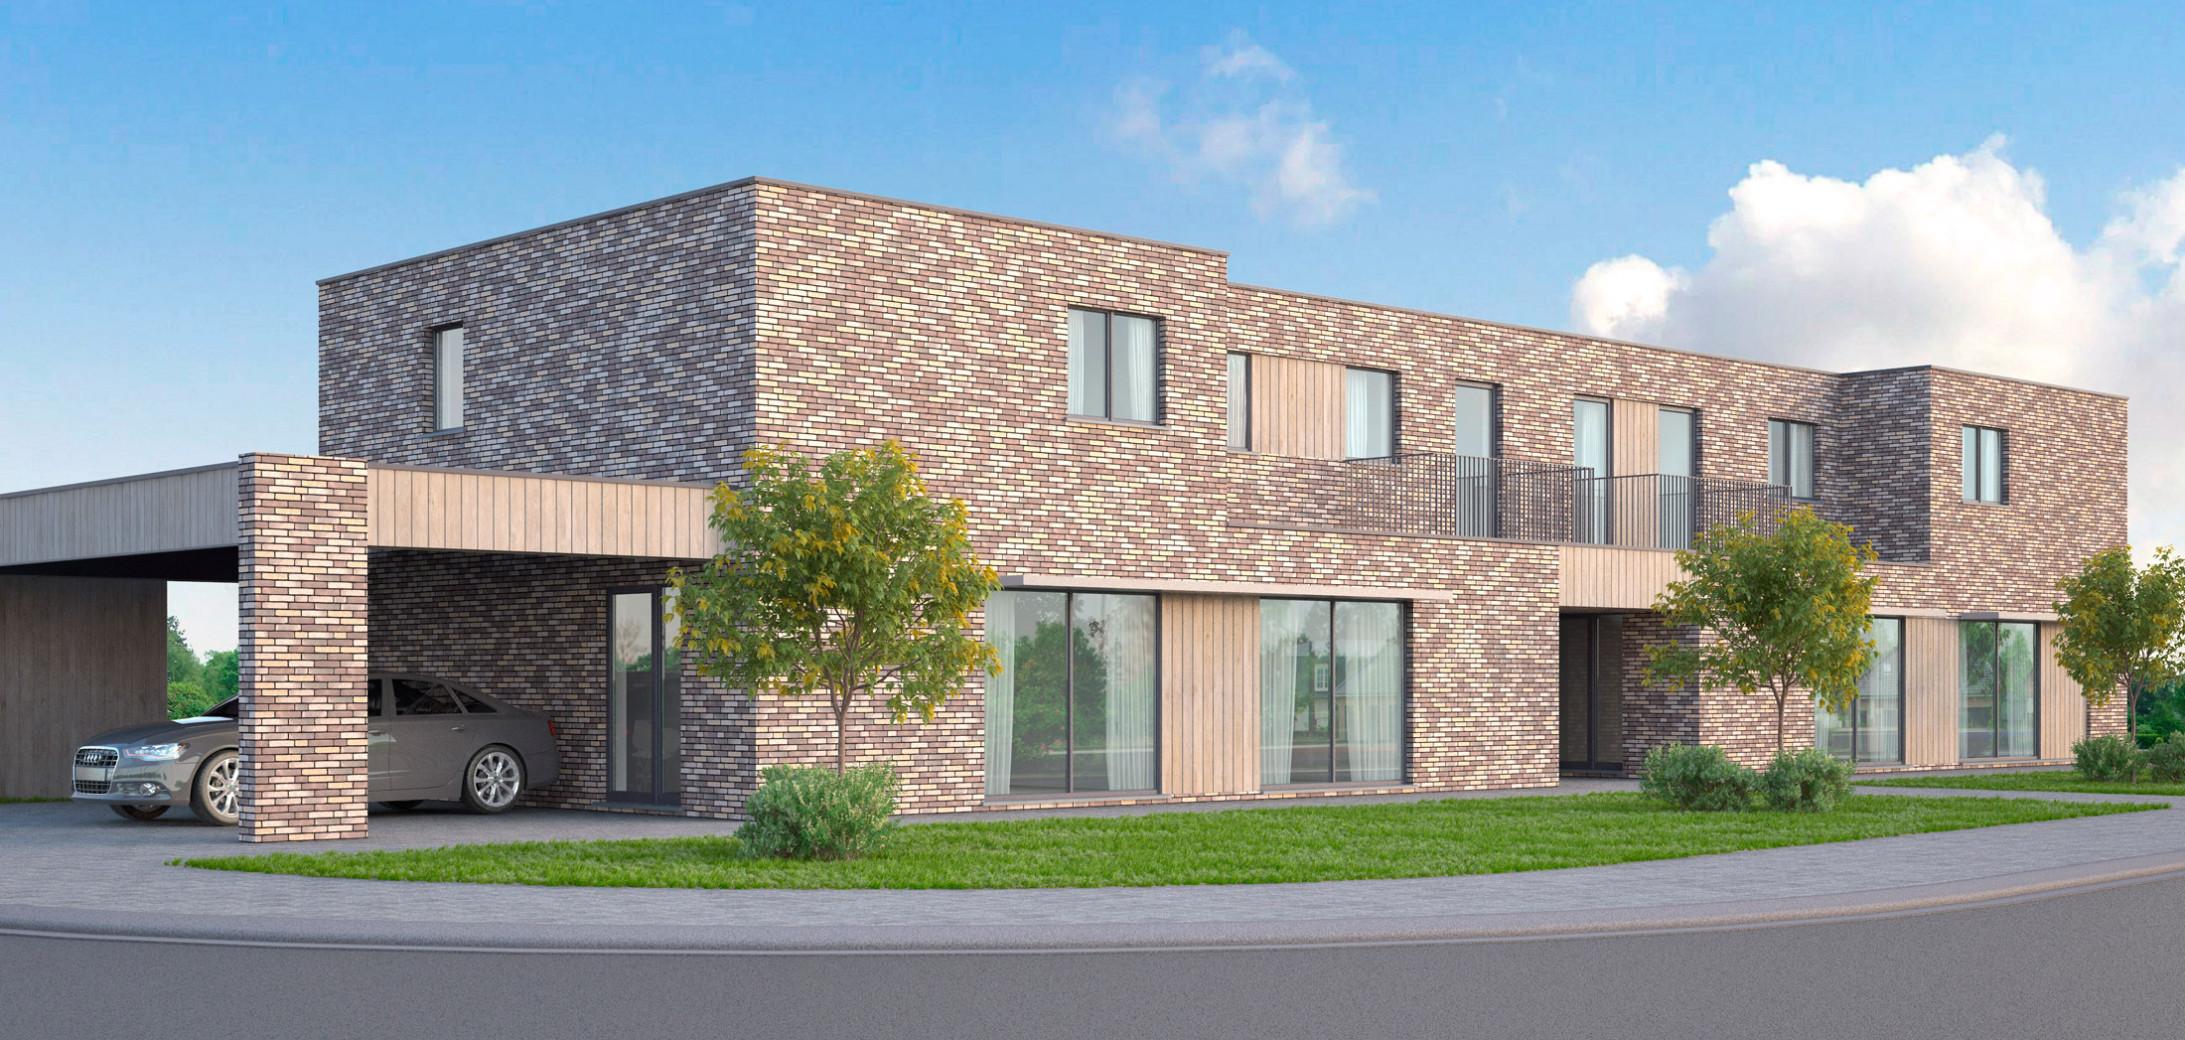 Sociale huisvesting2-Roeselare-CLaeys Architecten